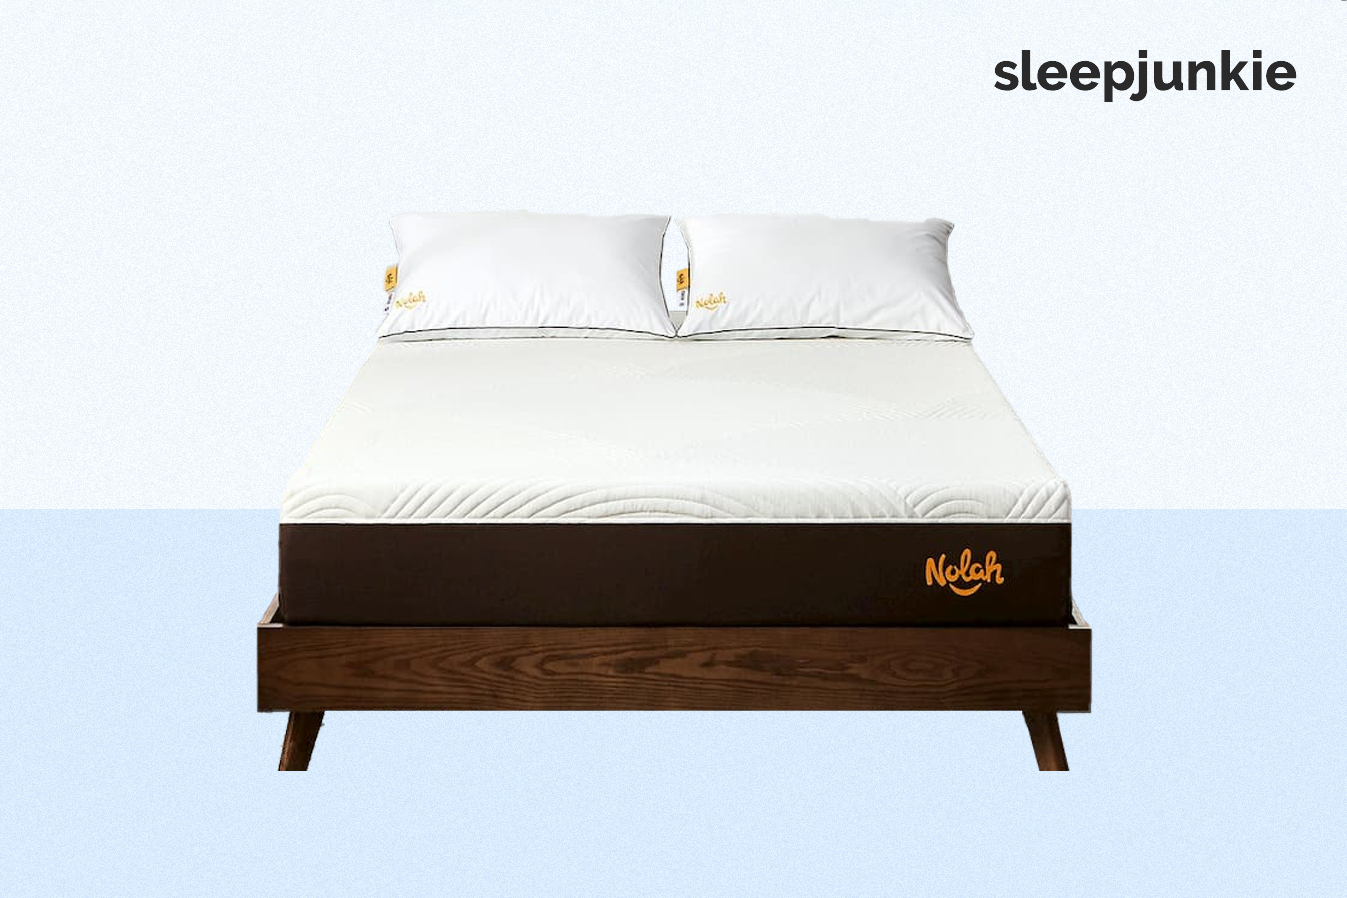 nolah mattress for side sleepers